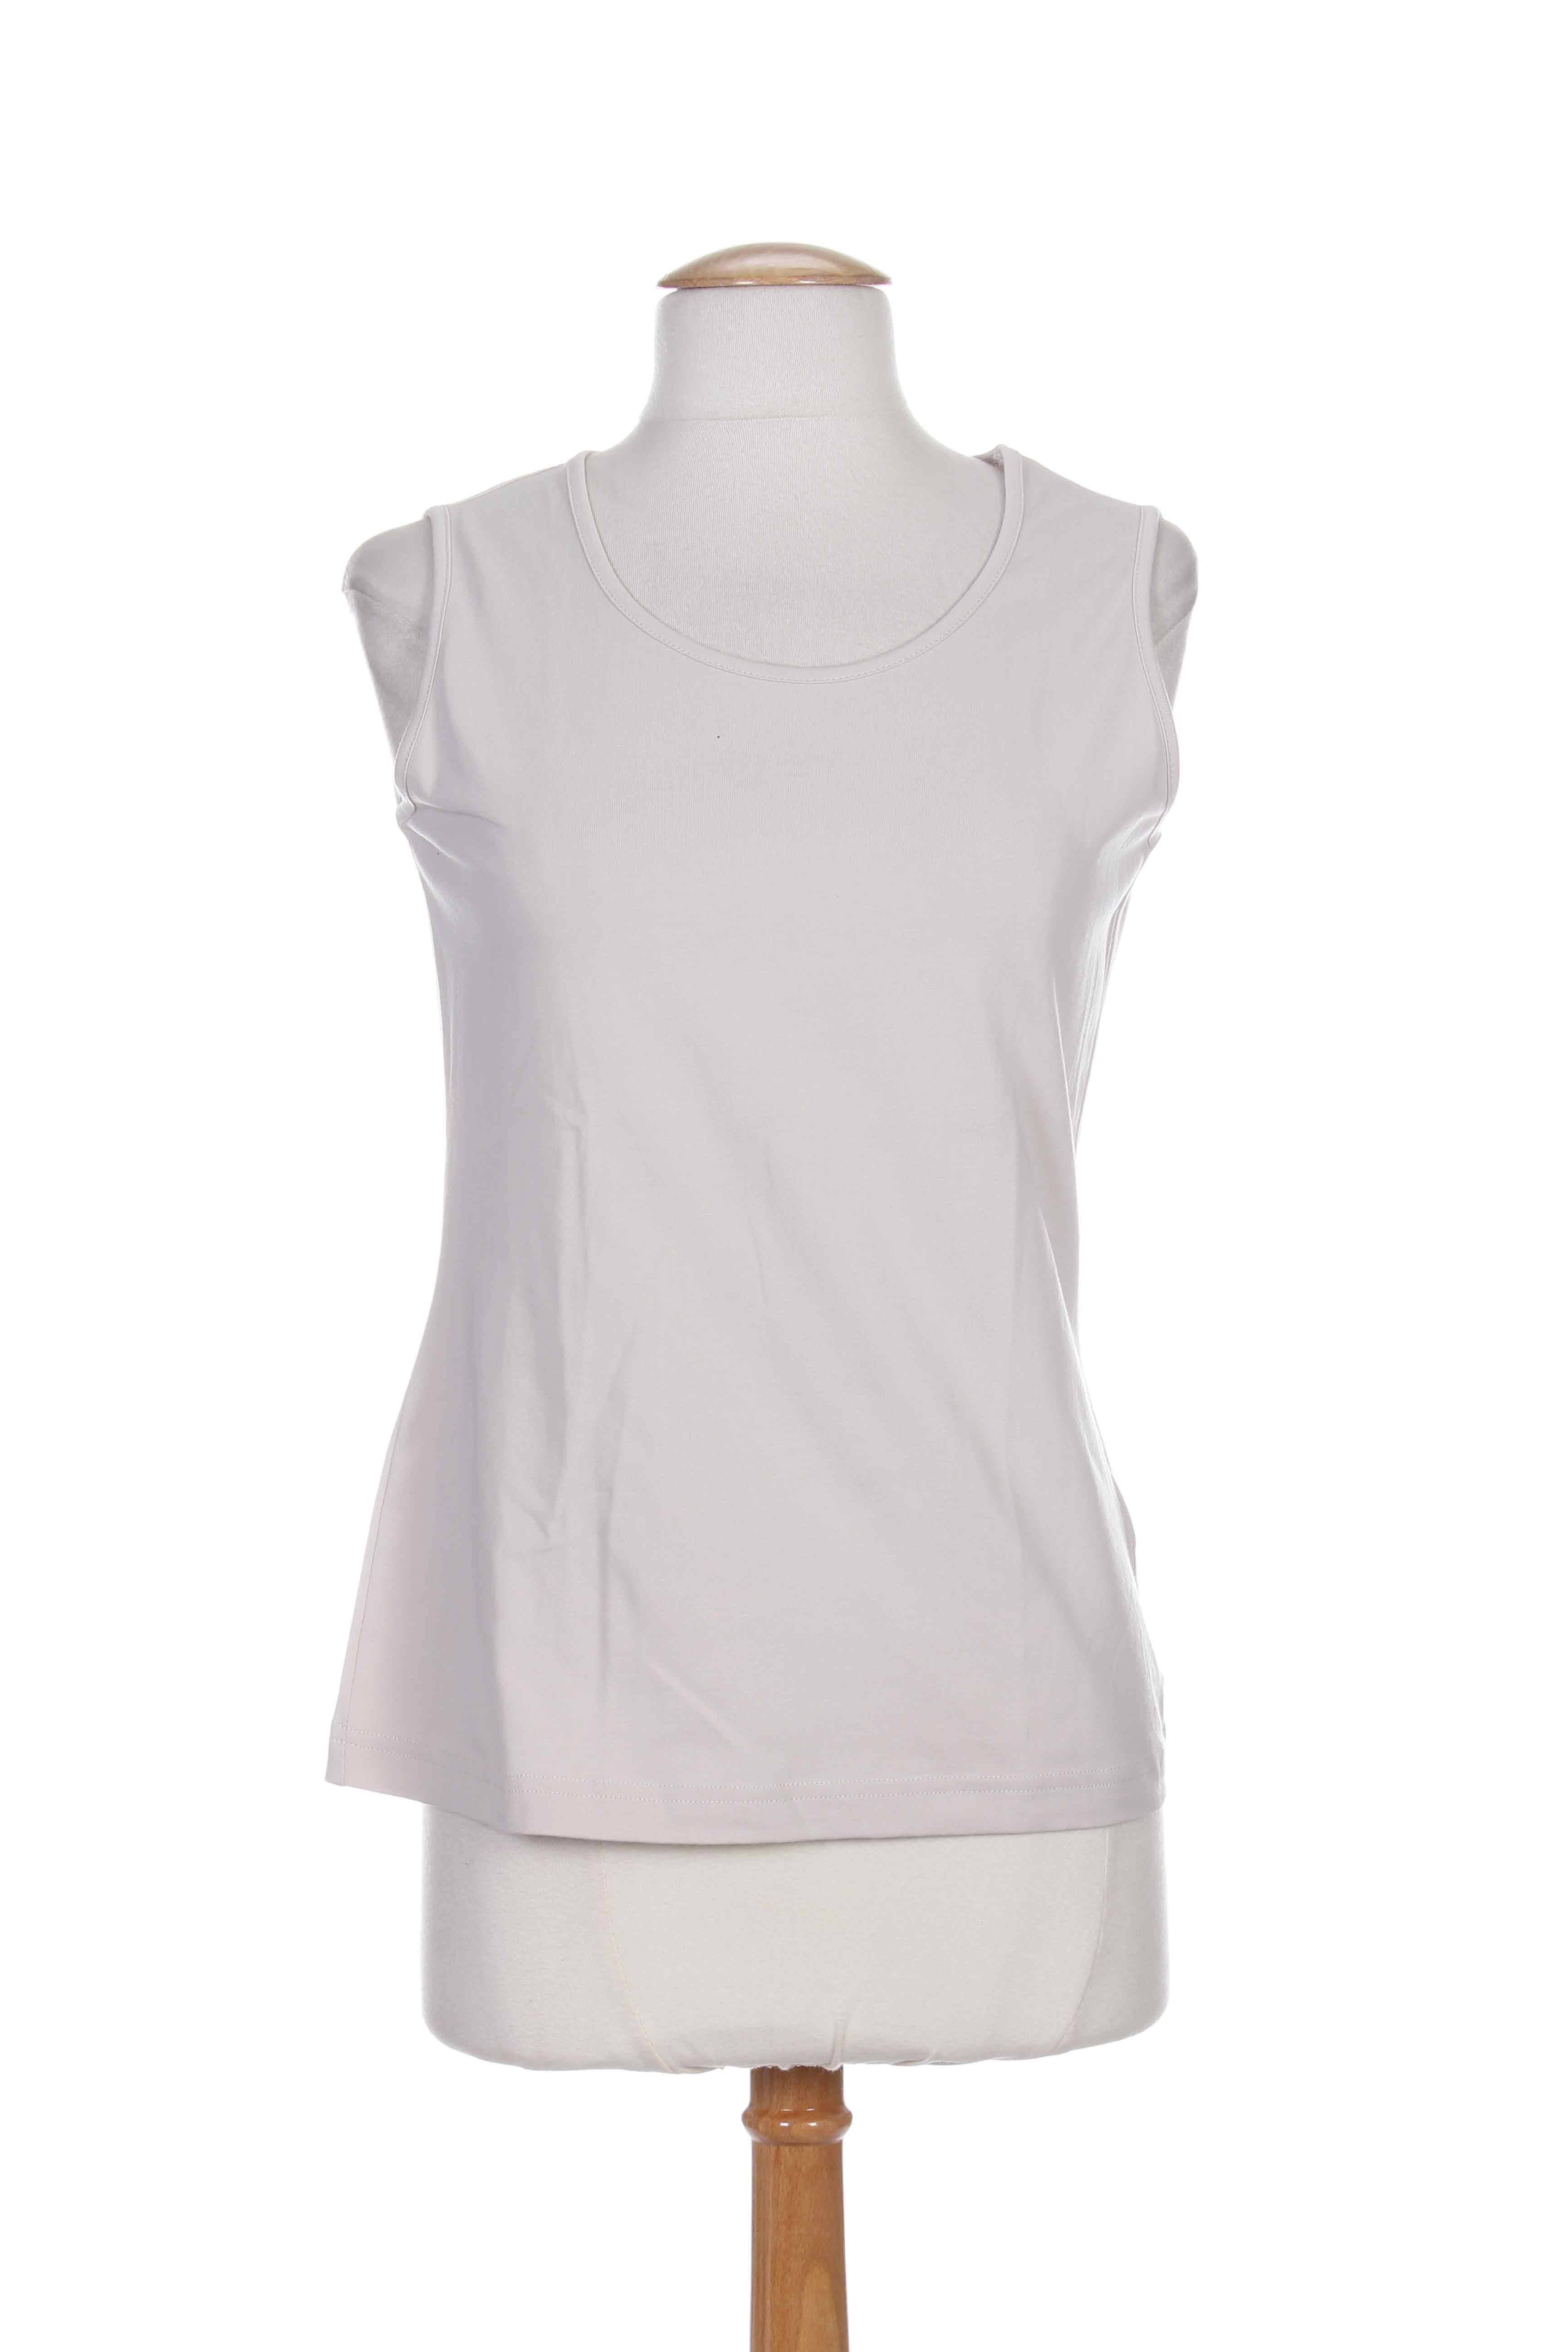 huge discount 39de2 b7597 debardeurs-femme-gris-gerry-weber-2012801401.jpg